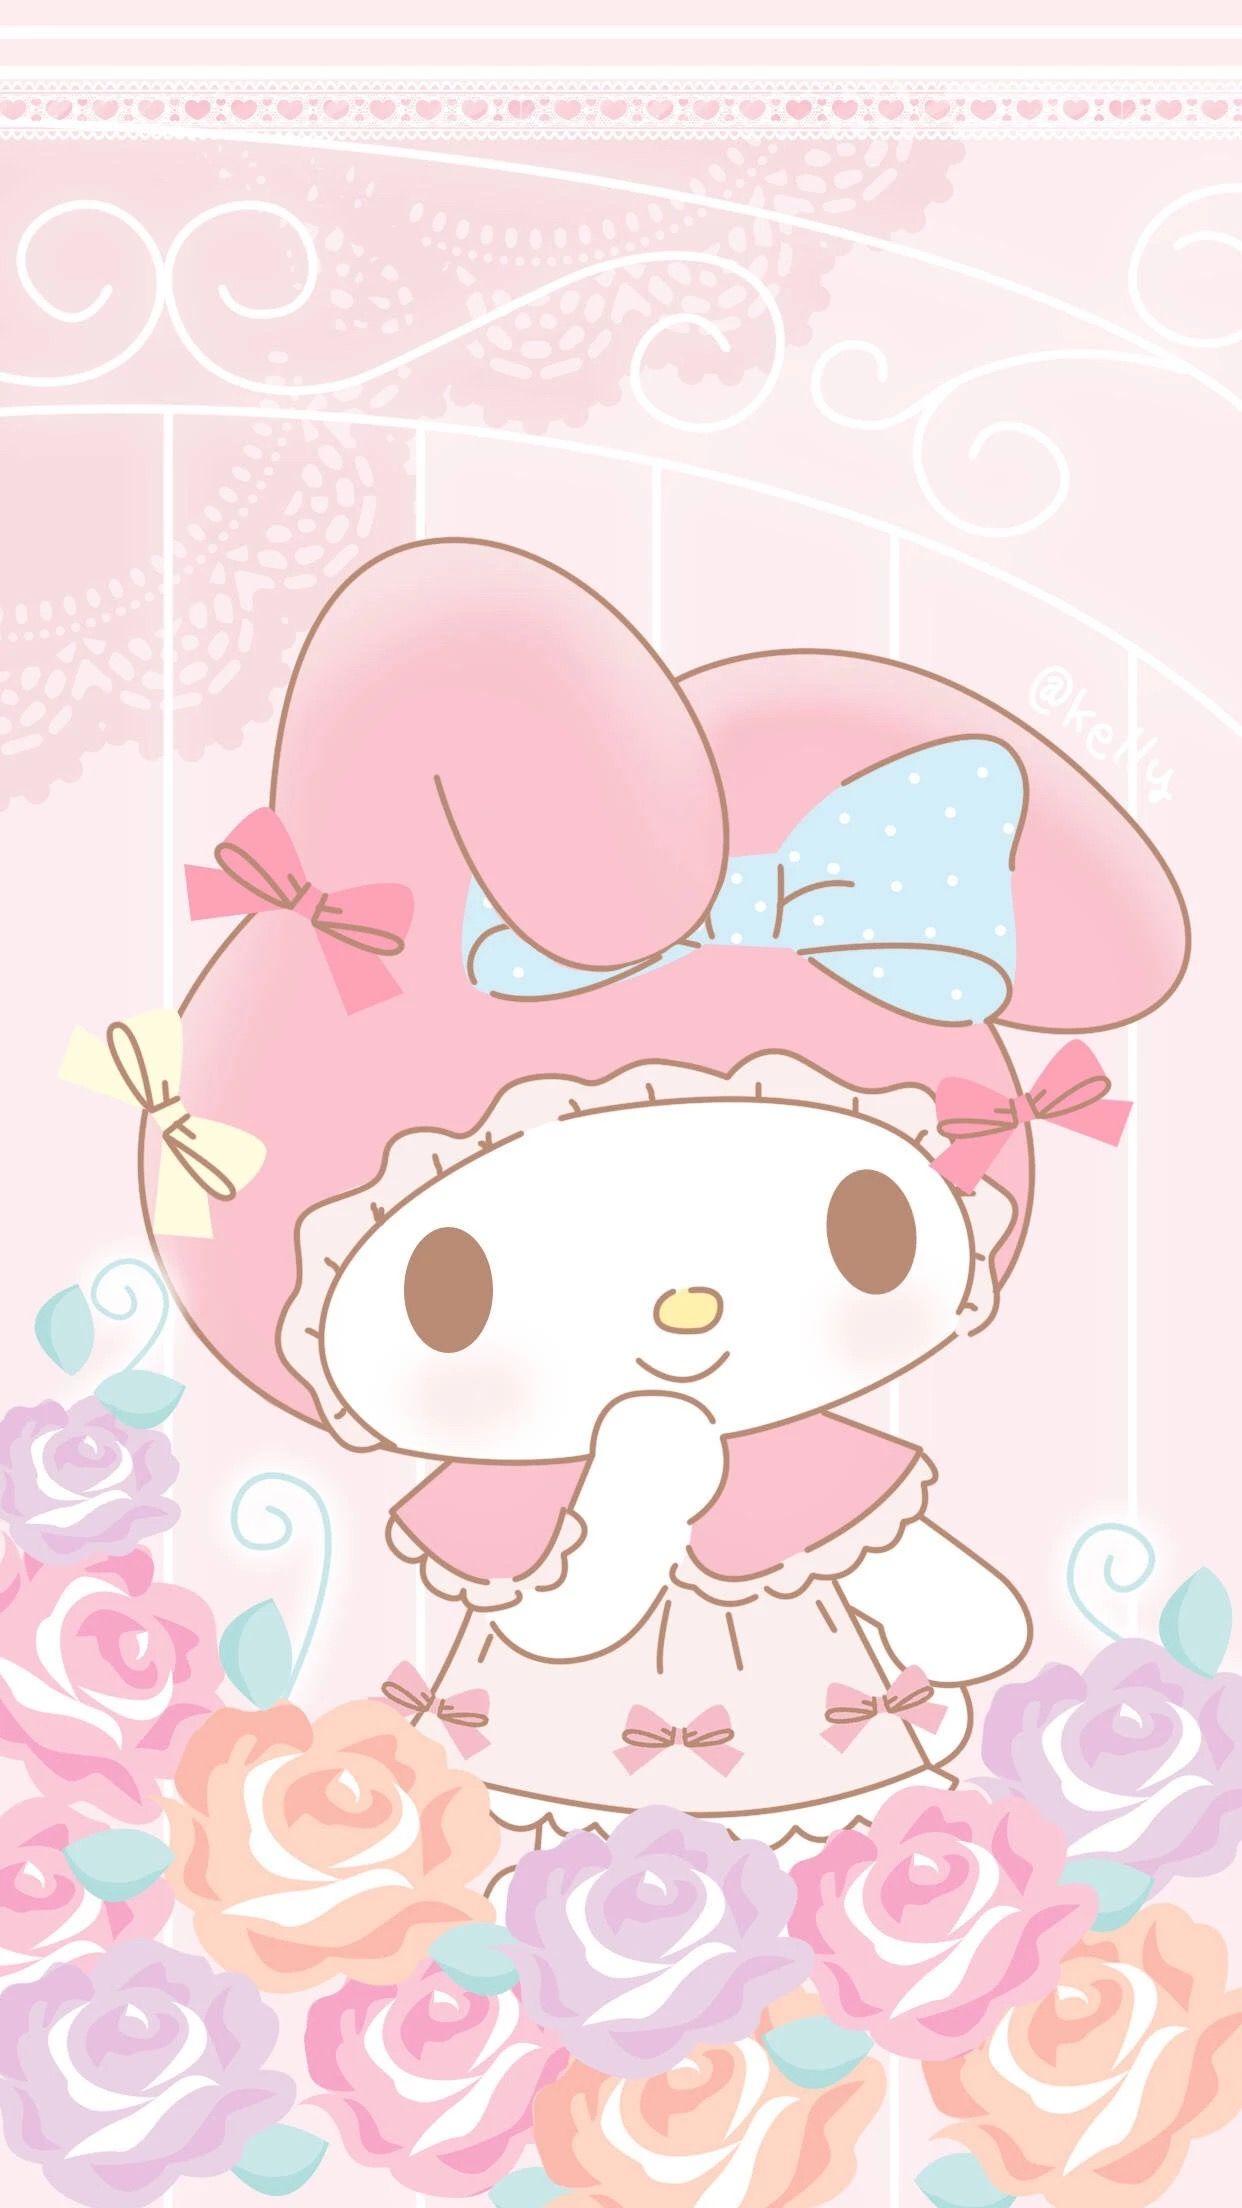 Simple Wallpaper Hello Kitty Strawberry - 3cc5ca7f11aeda12cbb351782af65148  You Should Have_756135.jpg